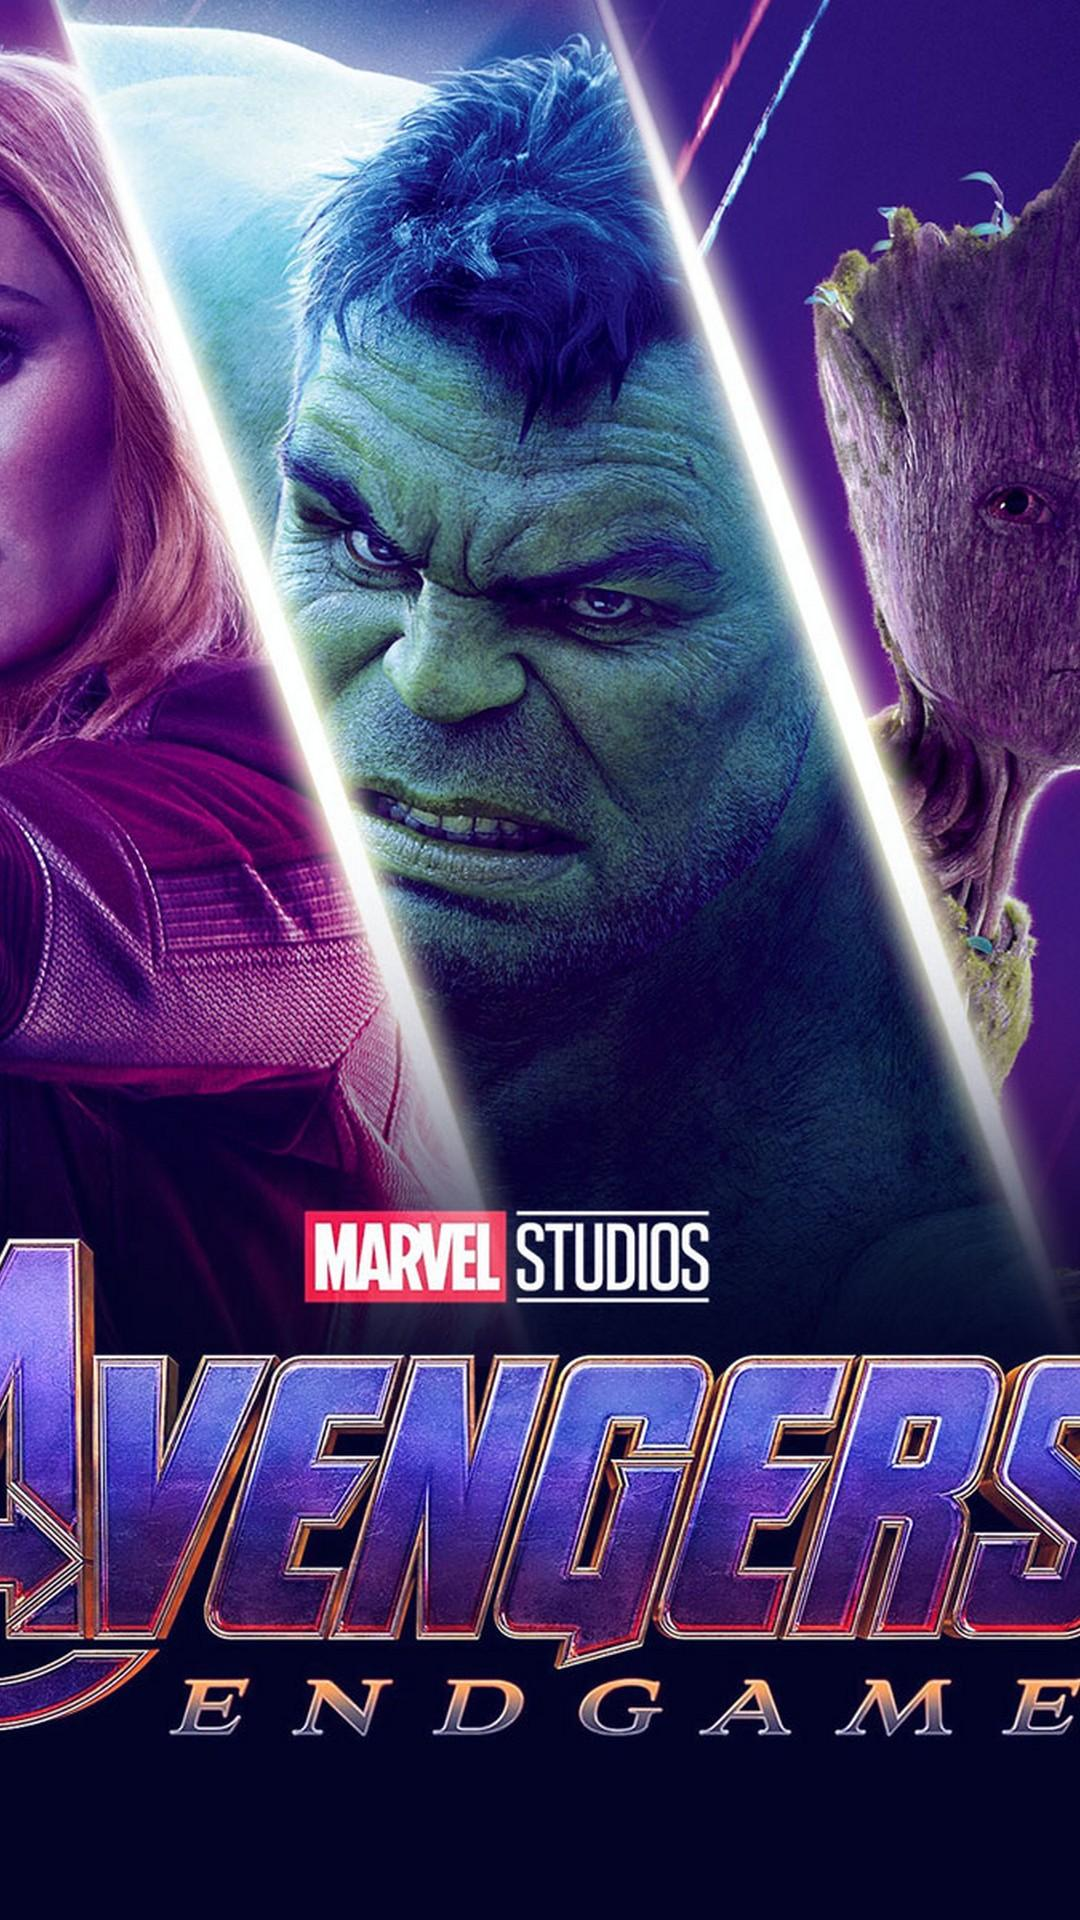 Hulk Endgame Wallpapers - Wallpaper Cave